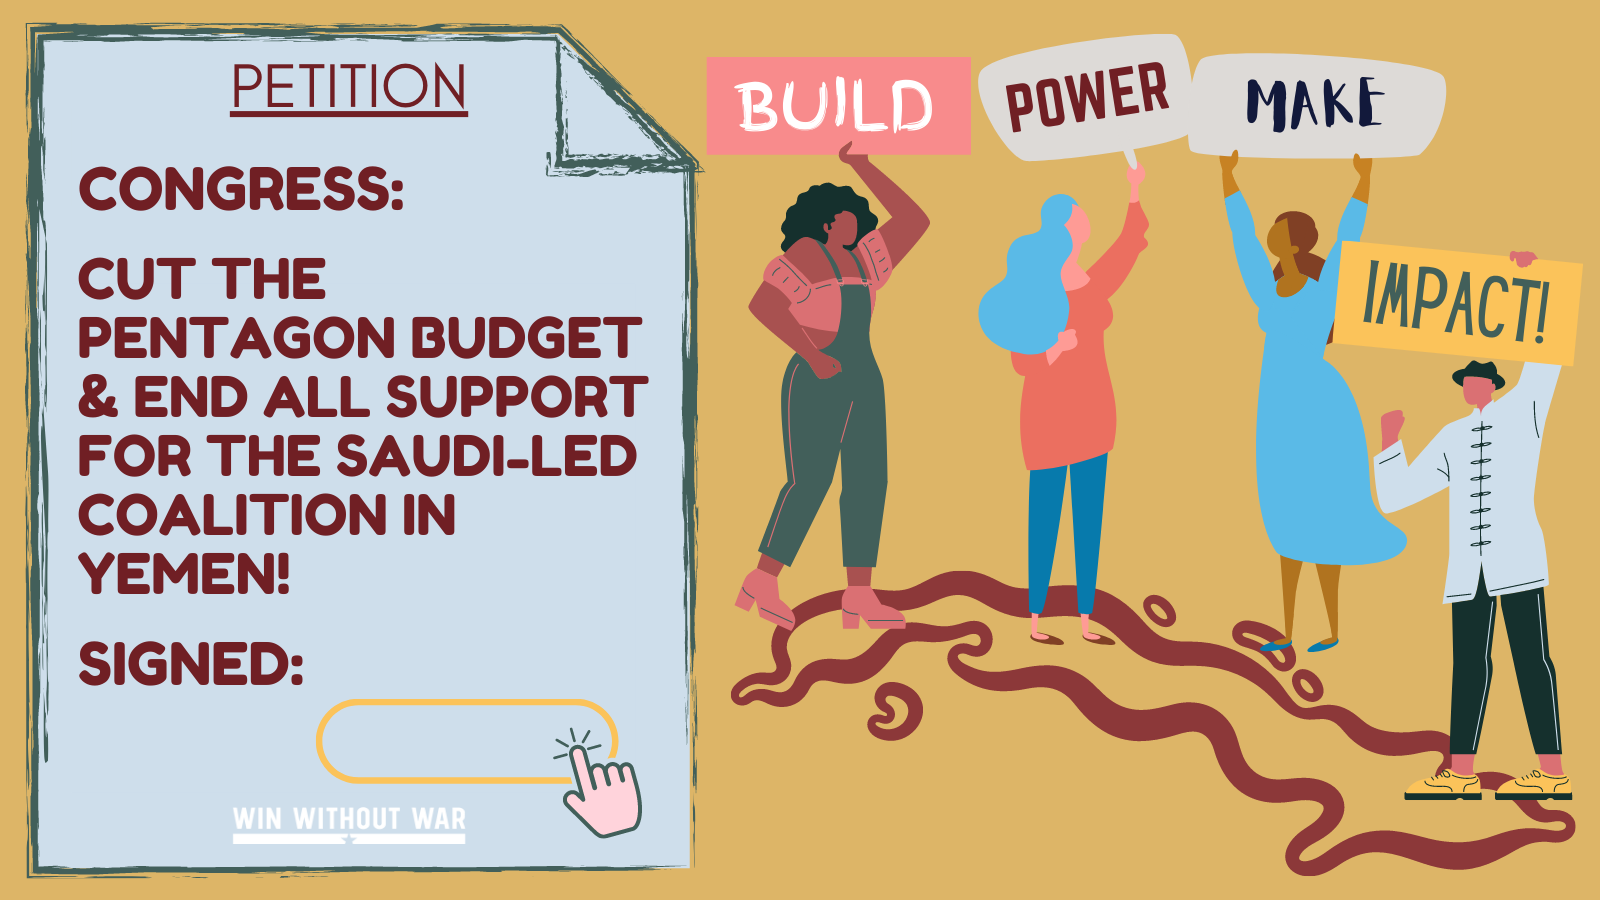 Congress: Cut the Pentagon Budget & end complicity in Yemen!